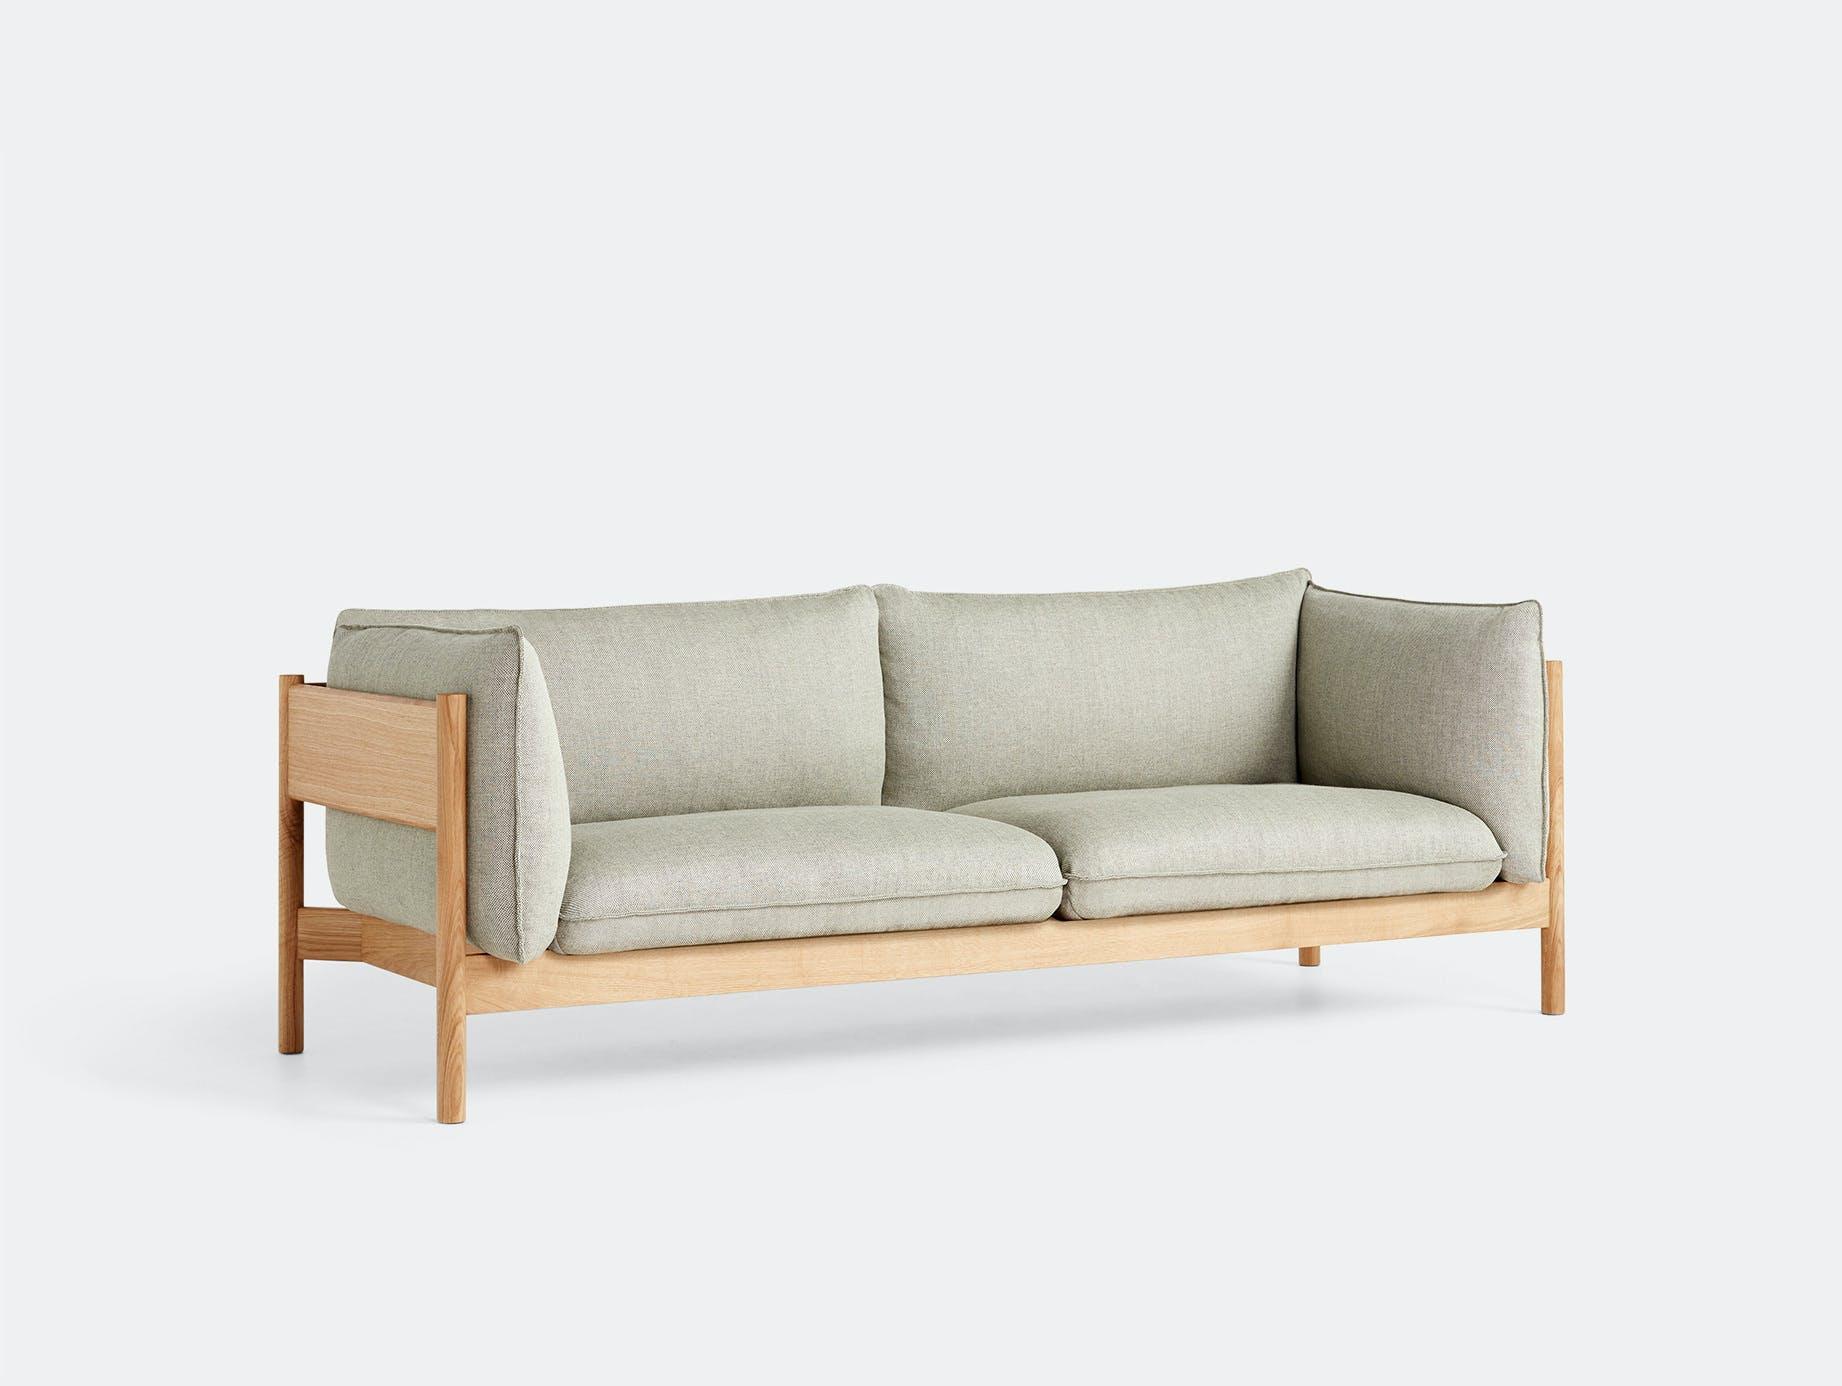 Hay arbour 3 seater sofa rewool 408 oak